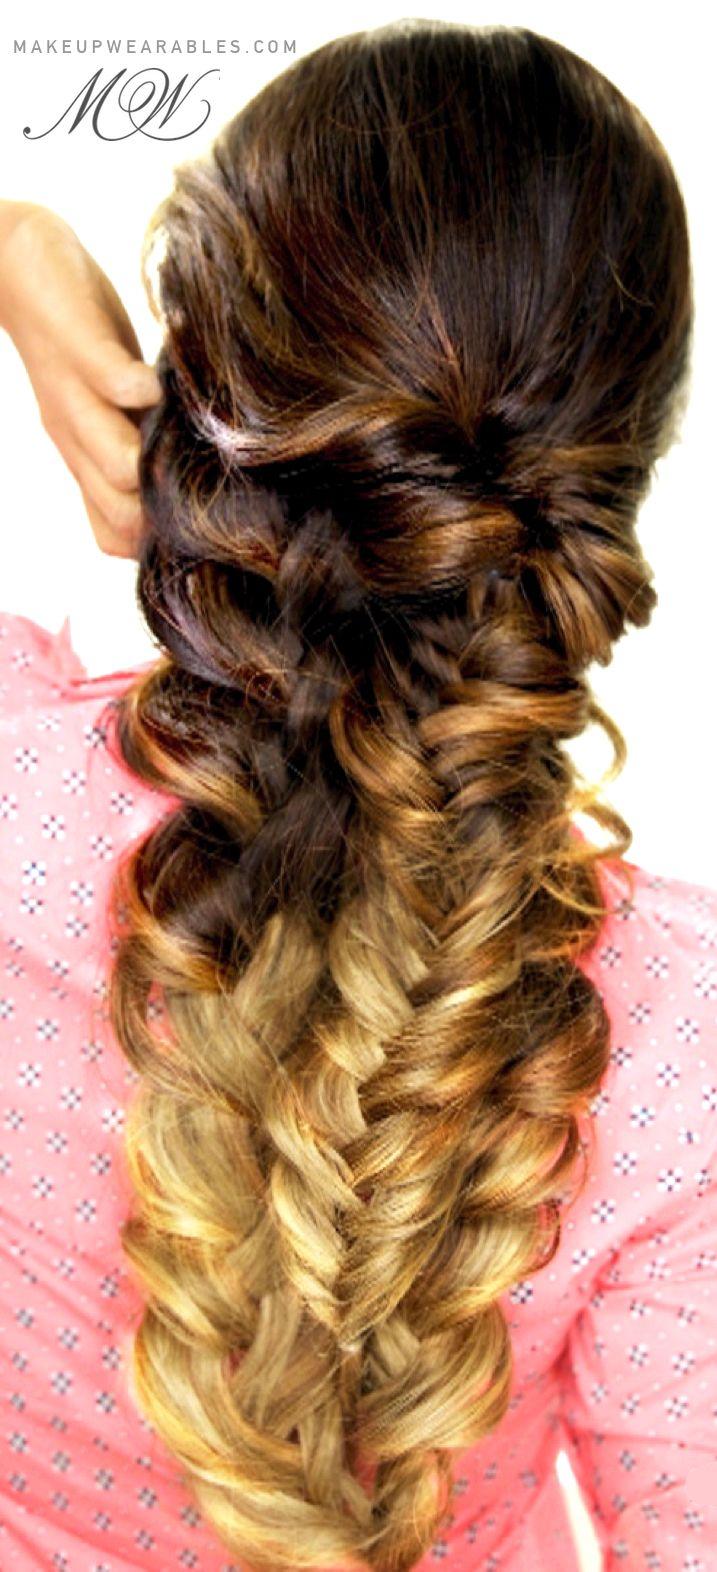 Easy Topsy-Tail Braid Hair Tutorial